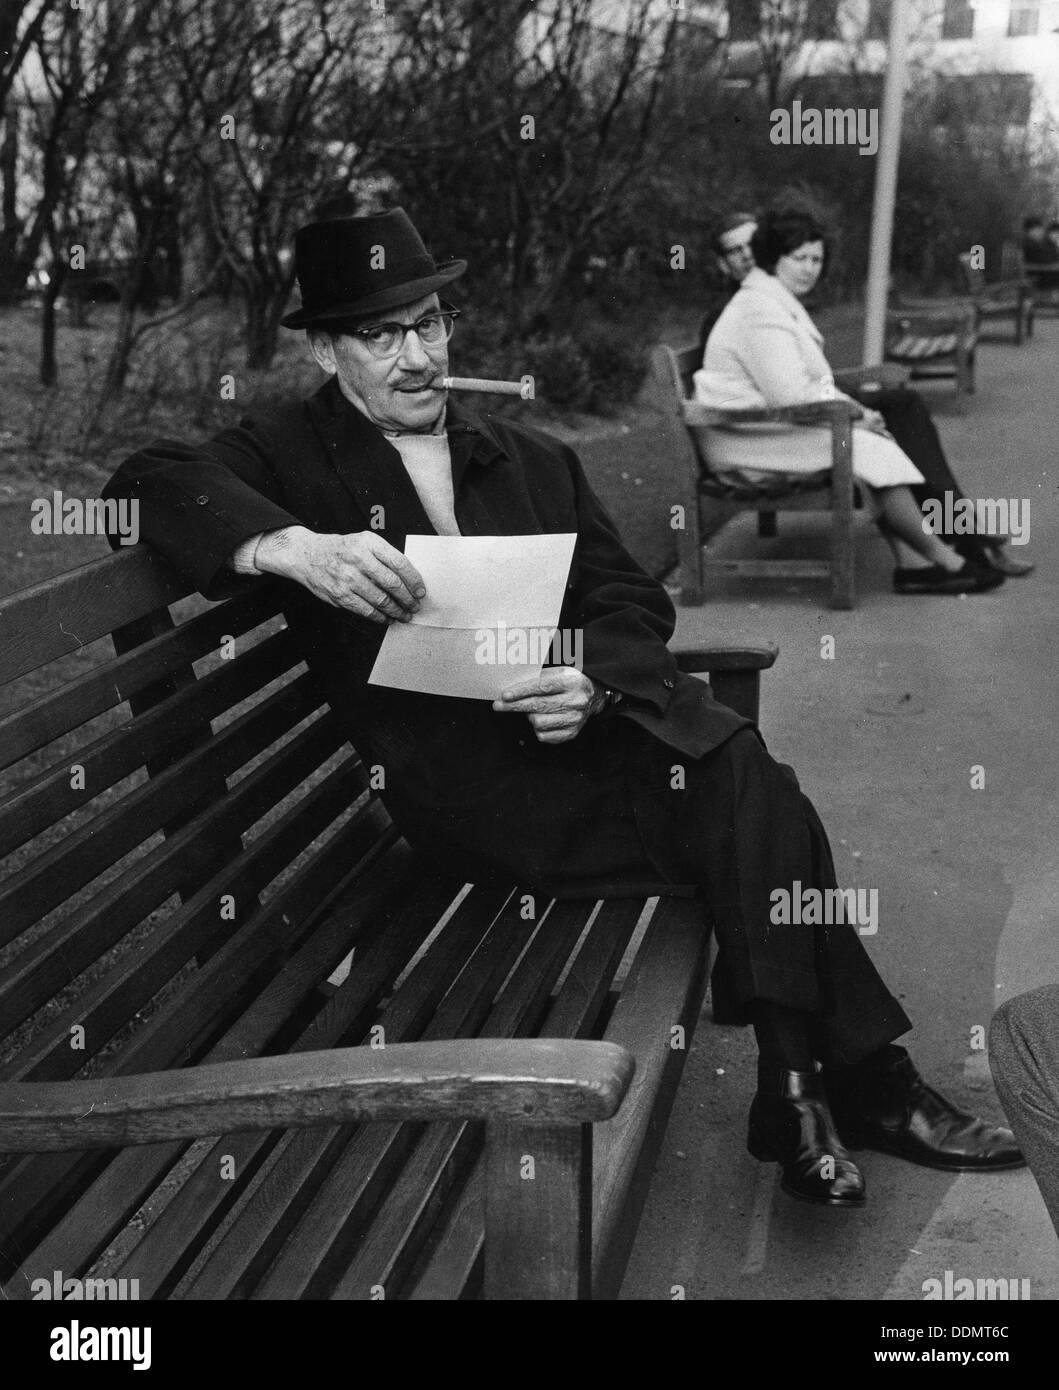 Groucho Marx (1890-1977), American comedian, 1965. Stock Photo